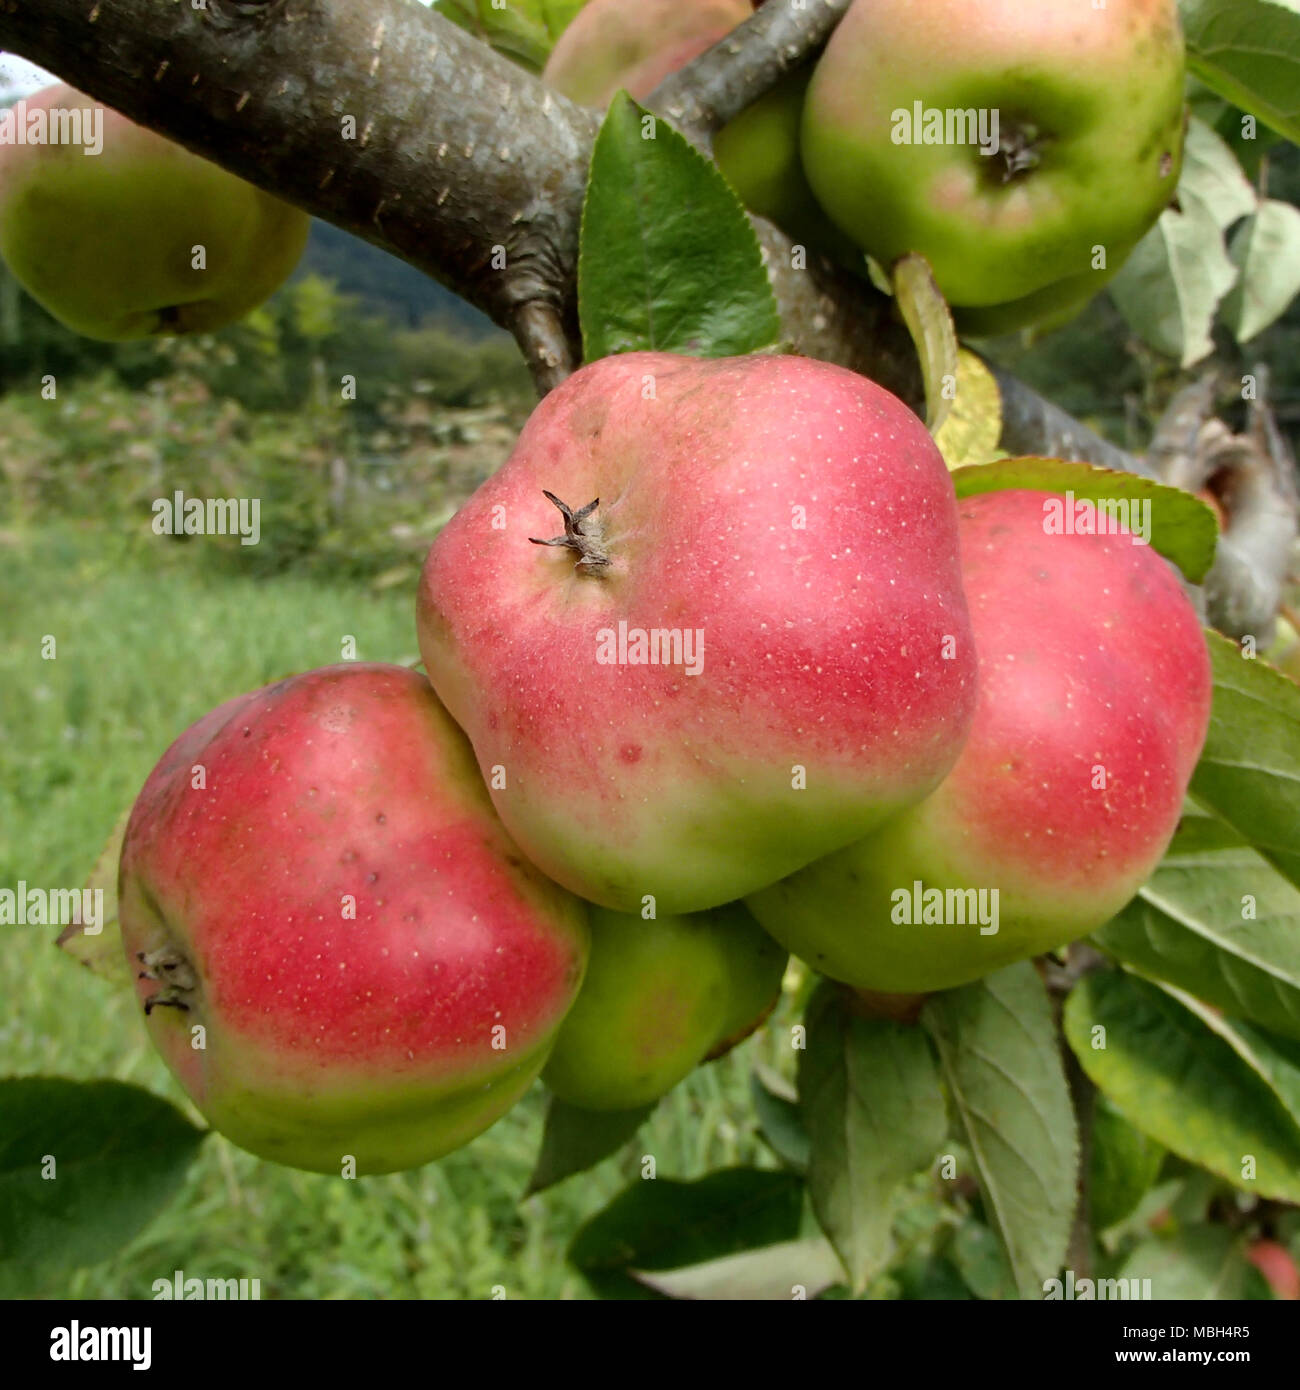 Three Starry Red Api Apples Close-Up Stock Photo